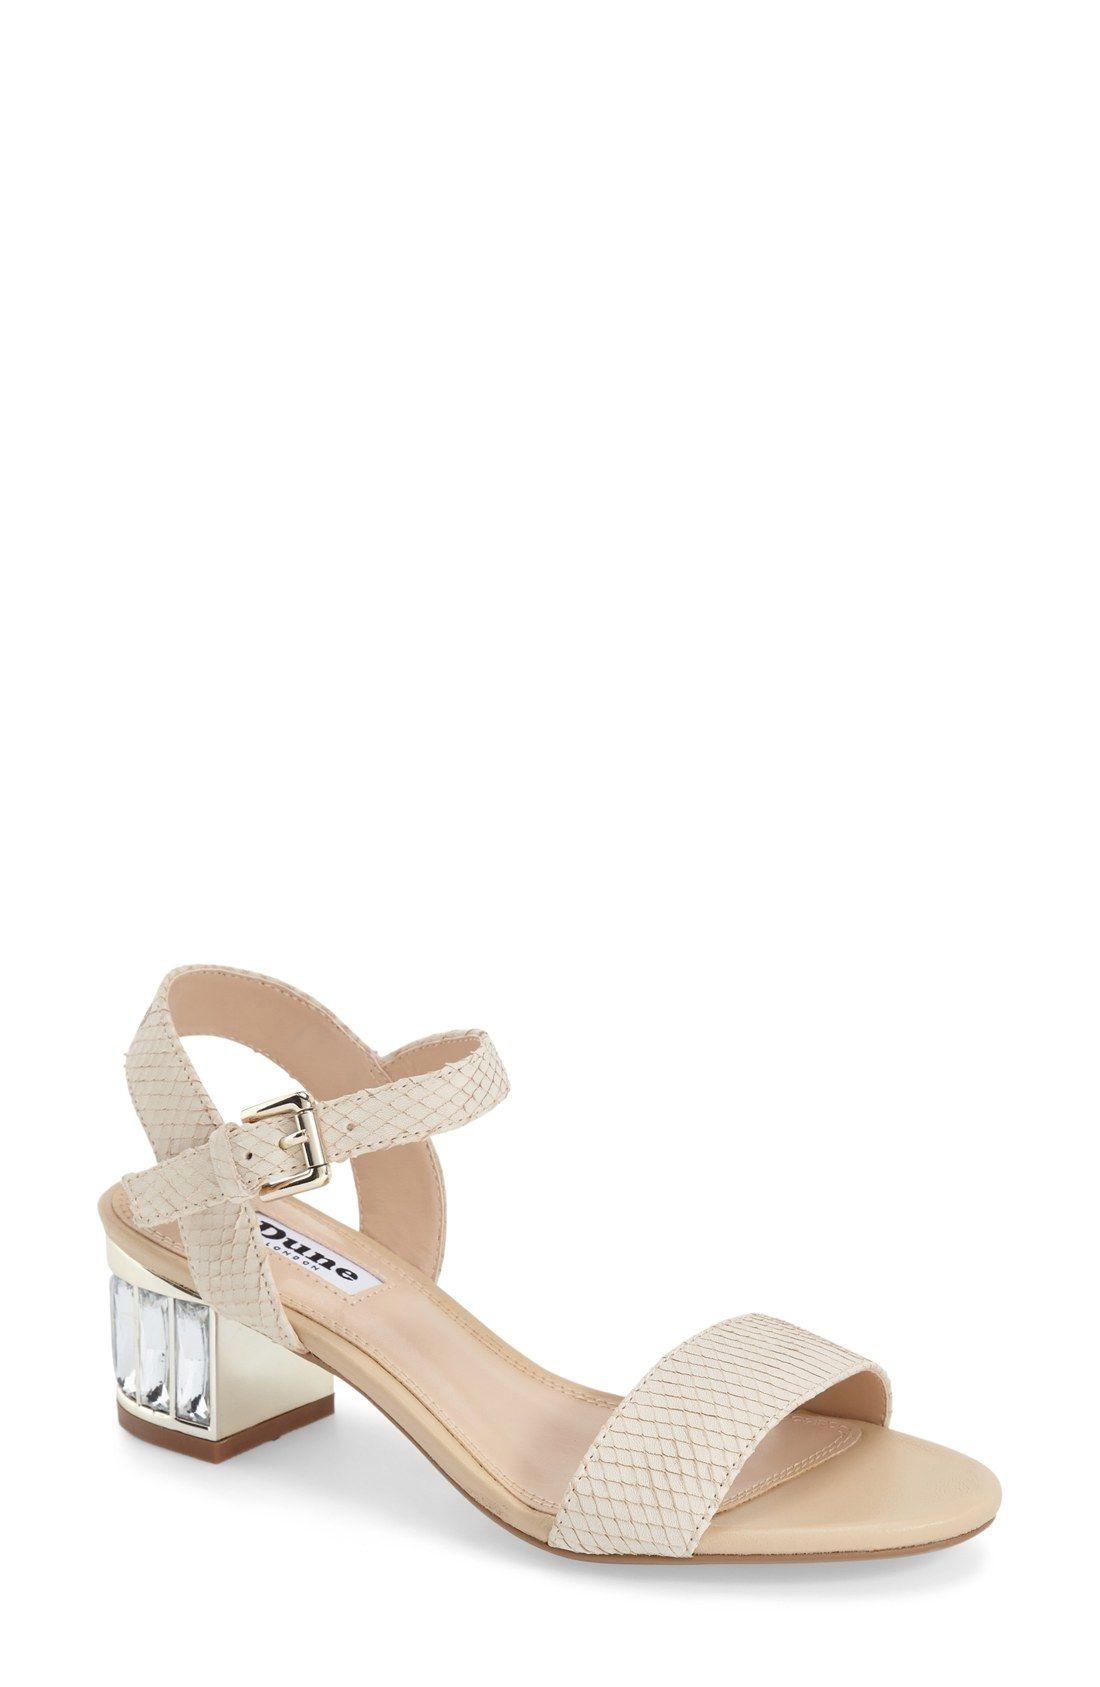 Dune London 'Maddie' Crystal Block Heel Sandal (Women)